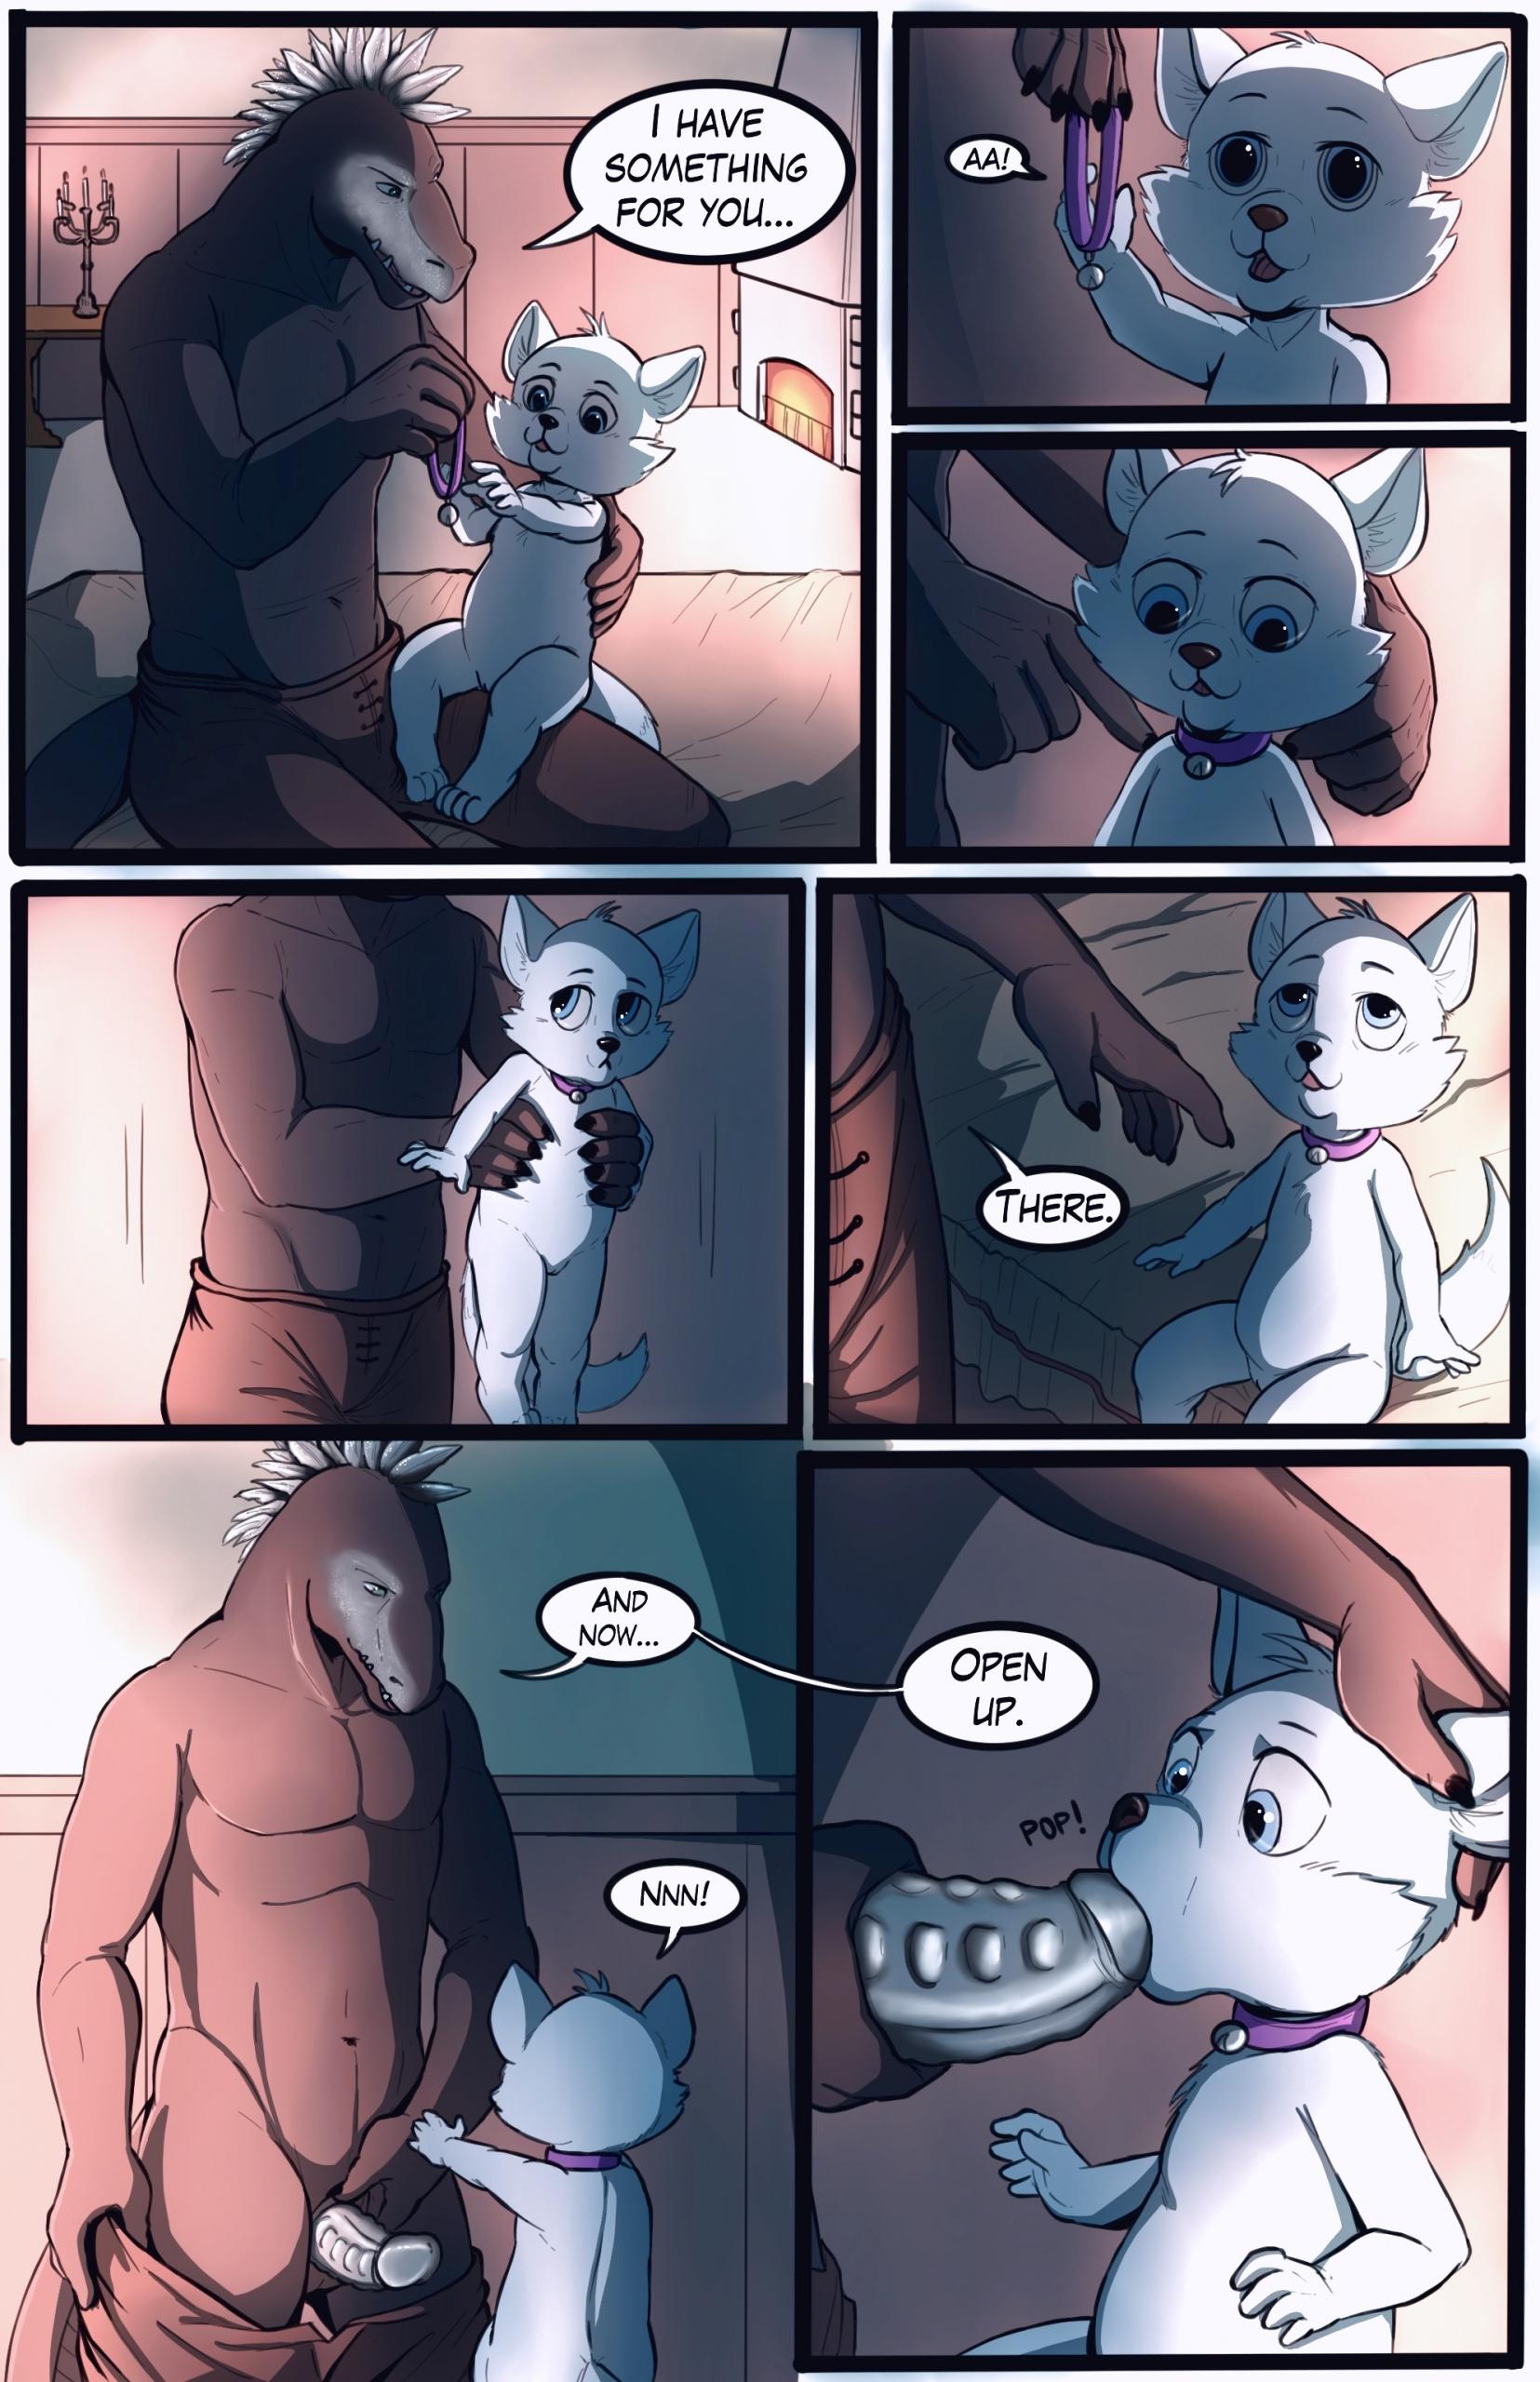 Good Girl furry porn comic page 01